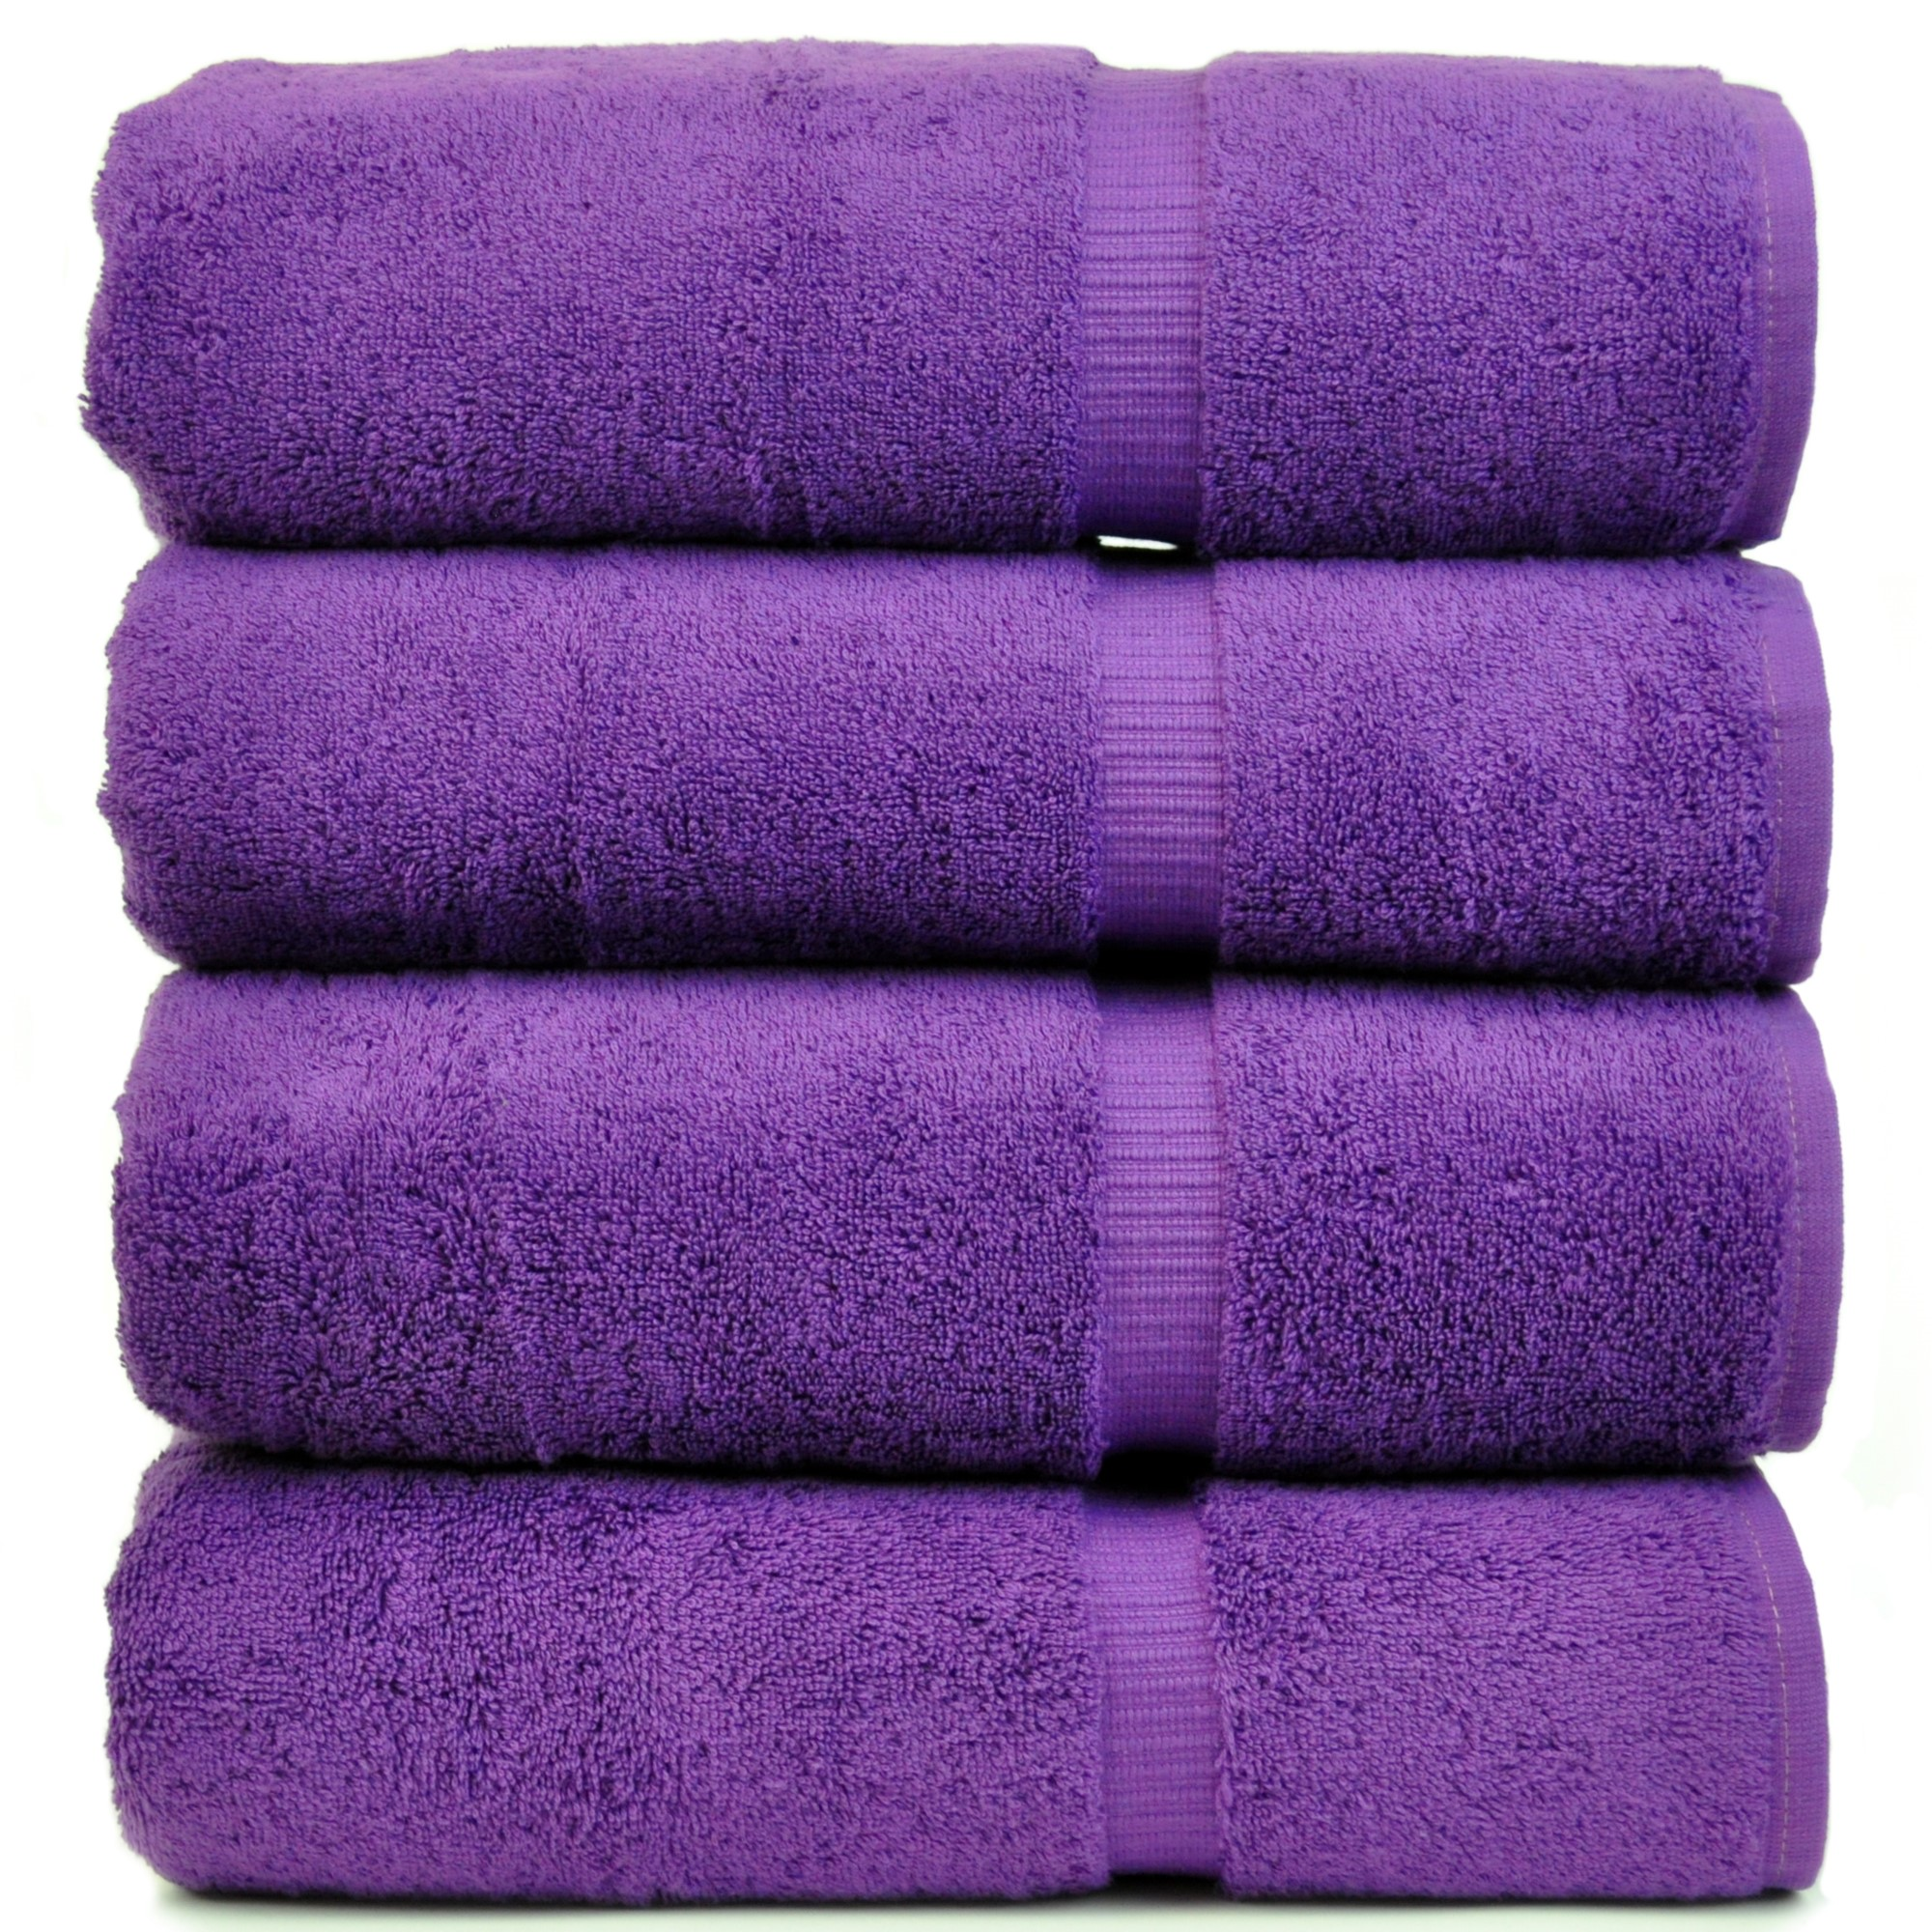 Chakir Linen Dobby Border Turkish Cotton Towel Set (Set of 4) by Chakir Linen